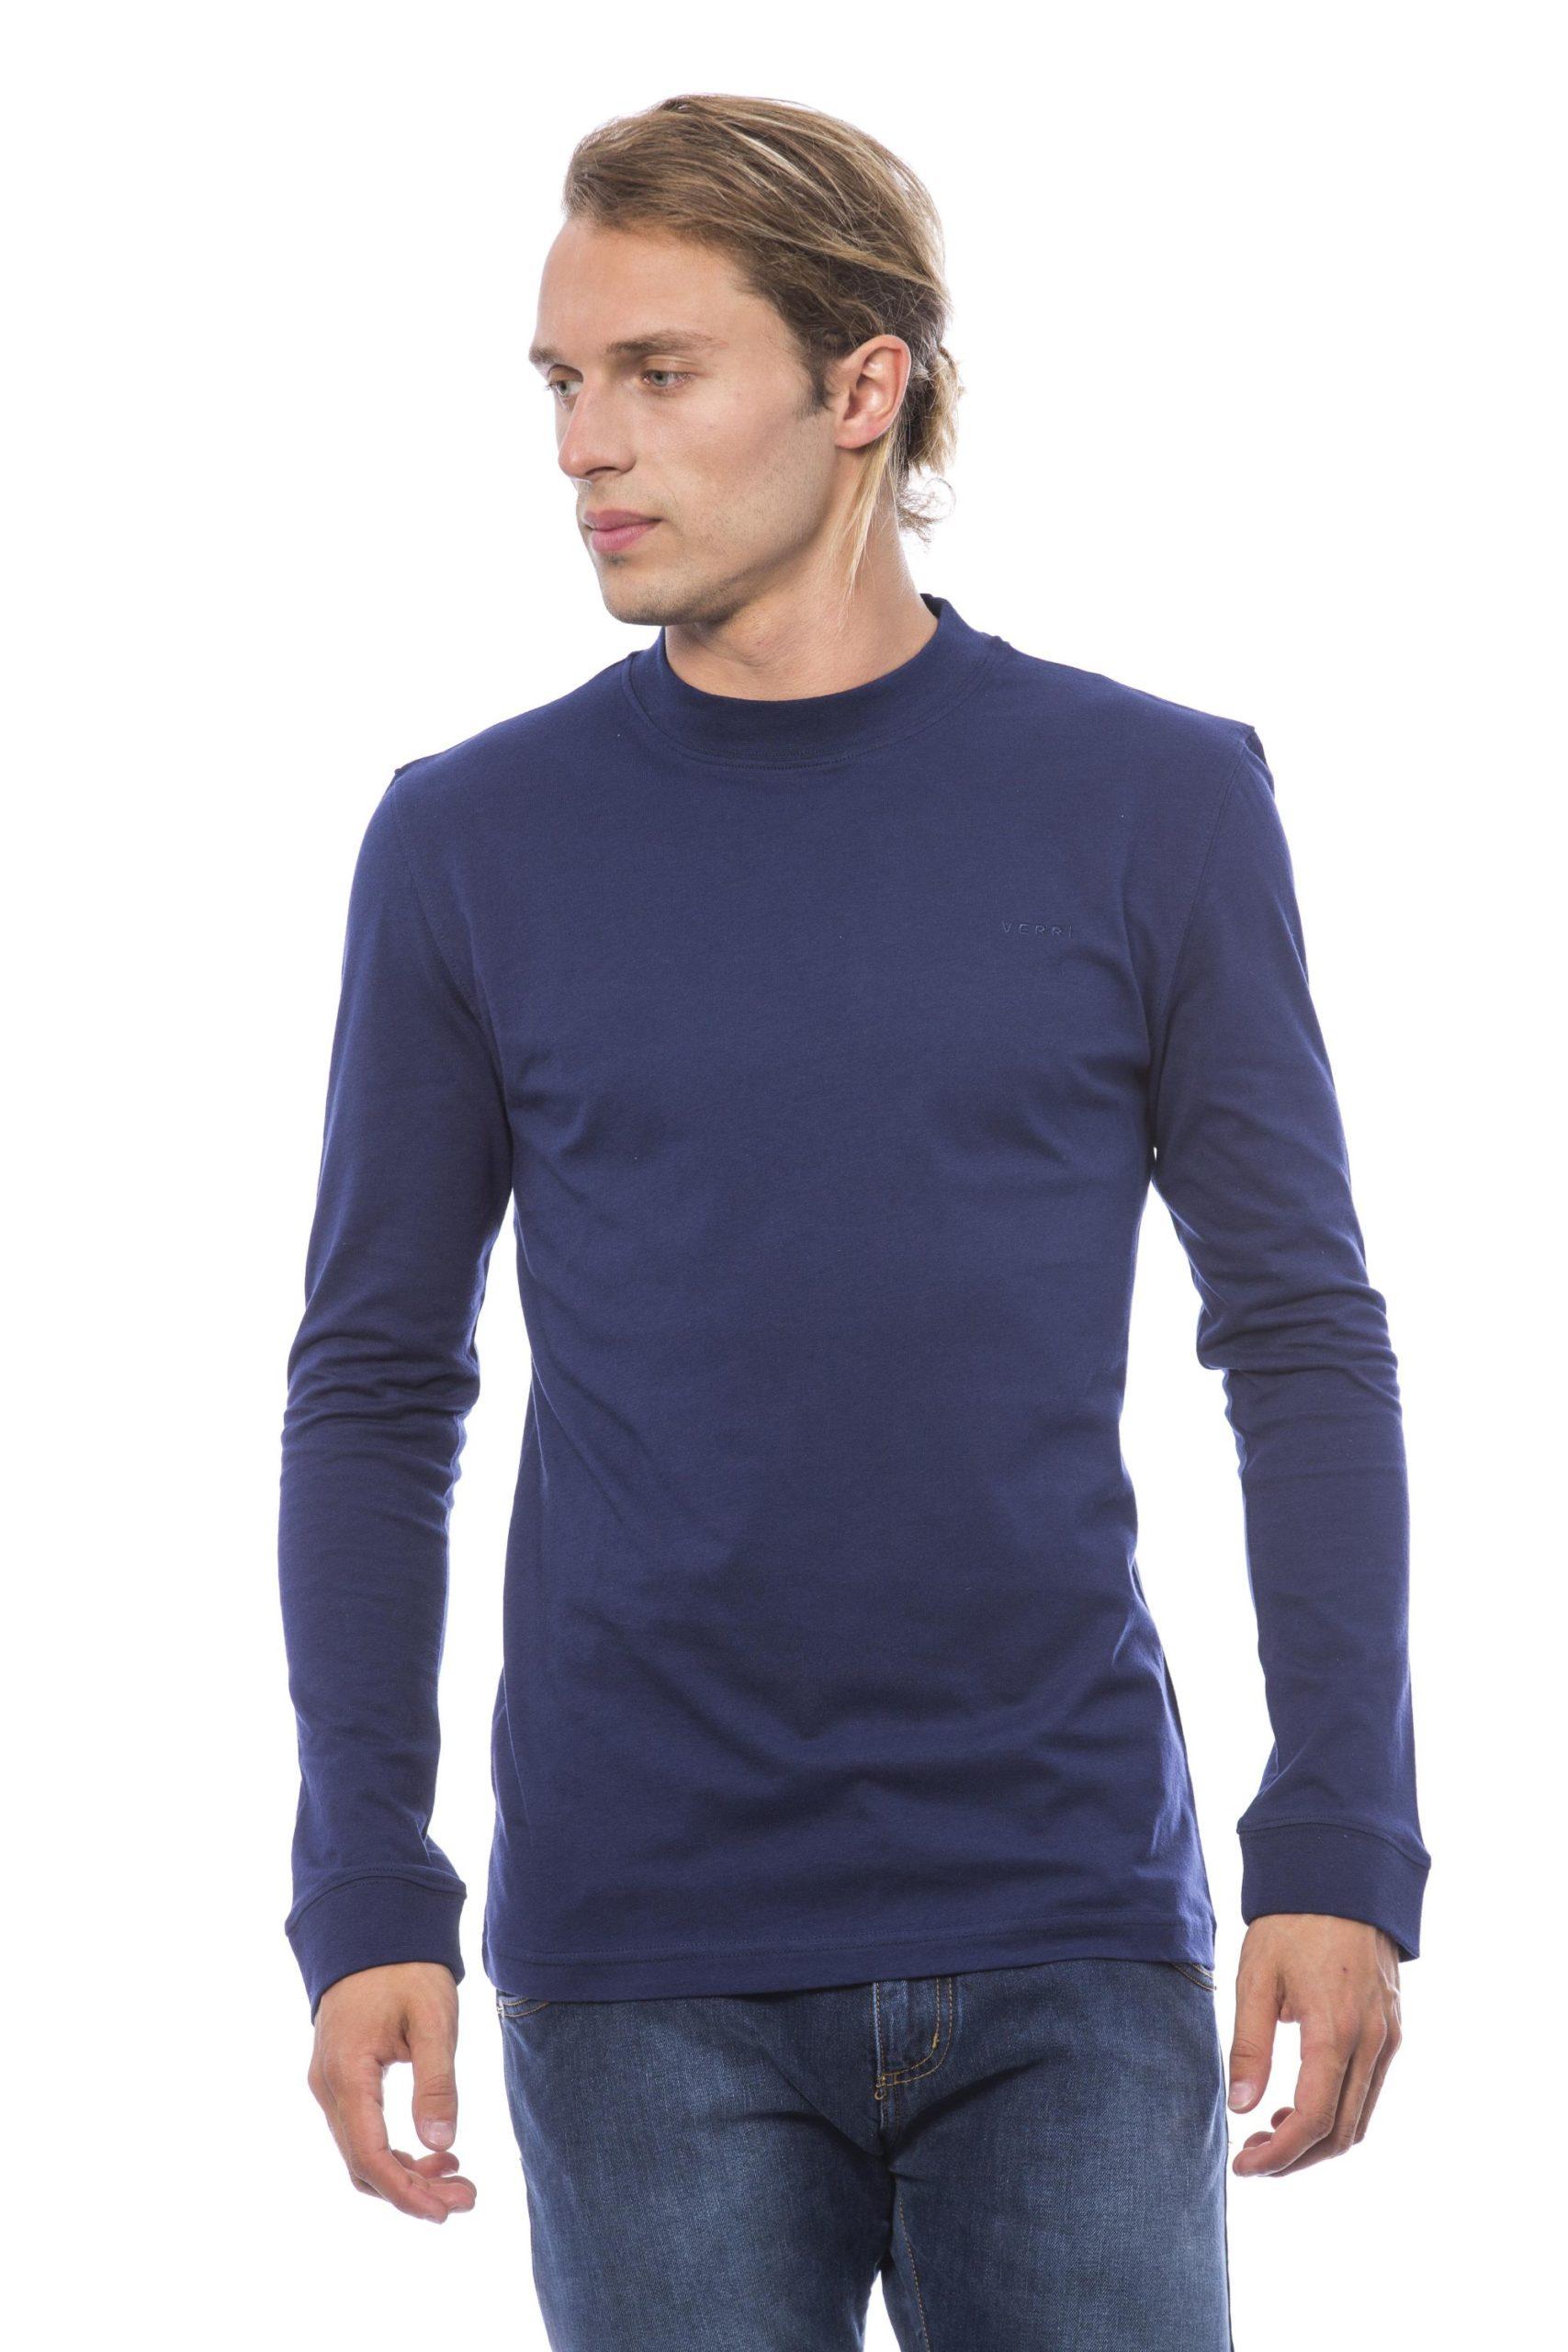 Verri Men's Vblu Sweater Blue VE816383 - S